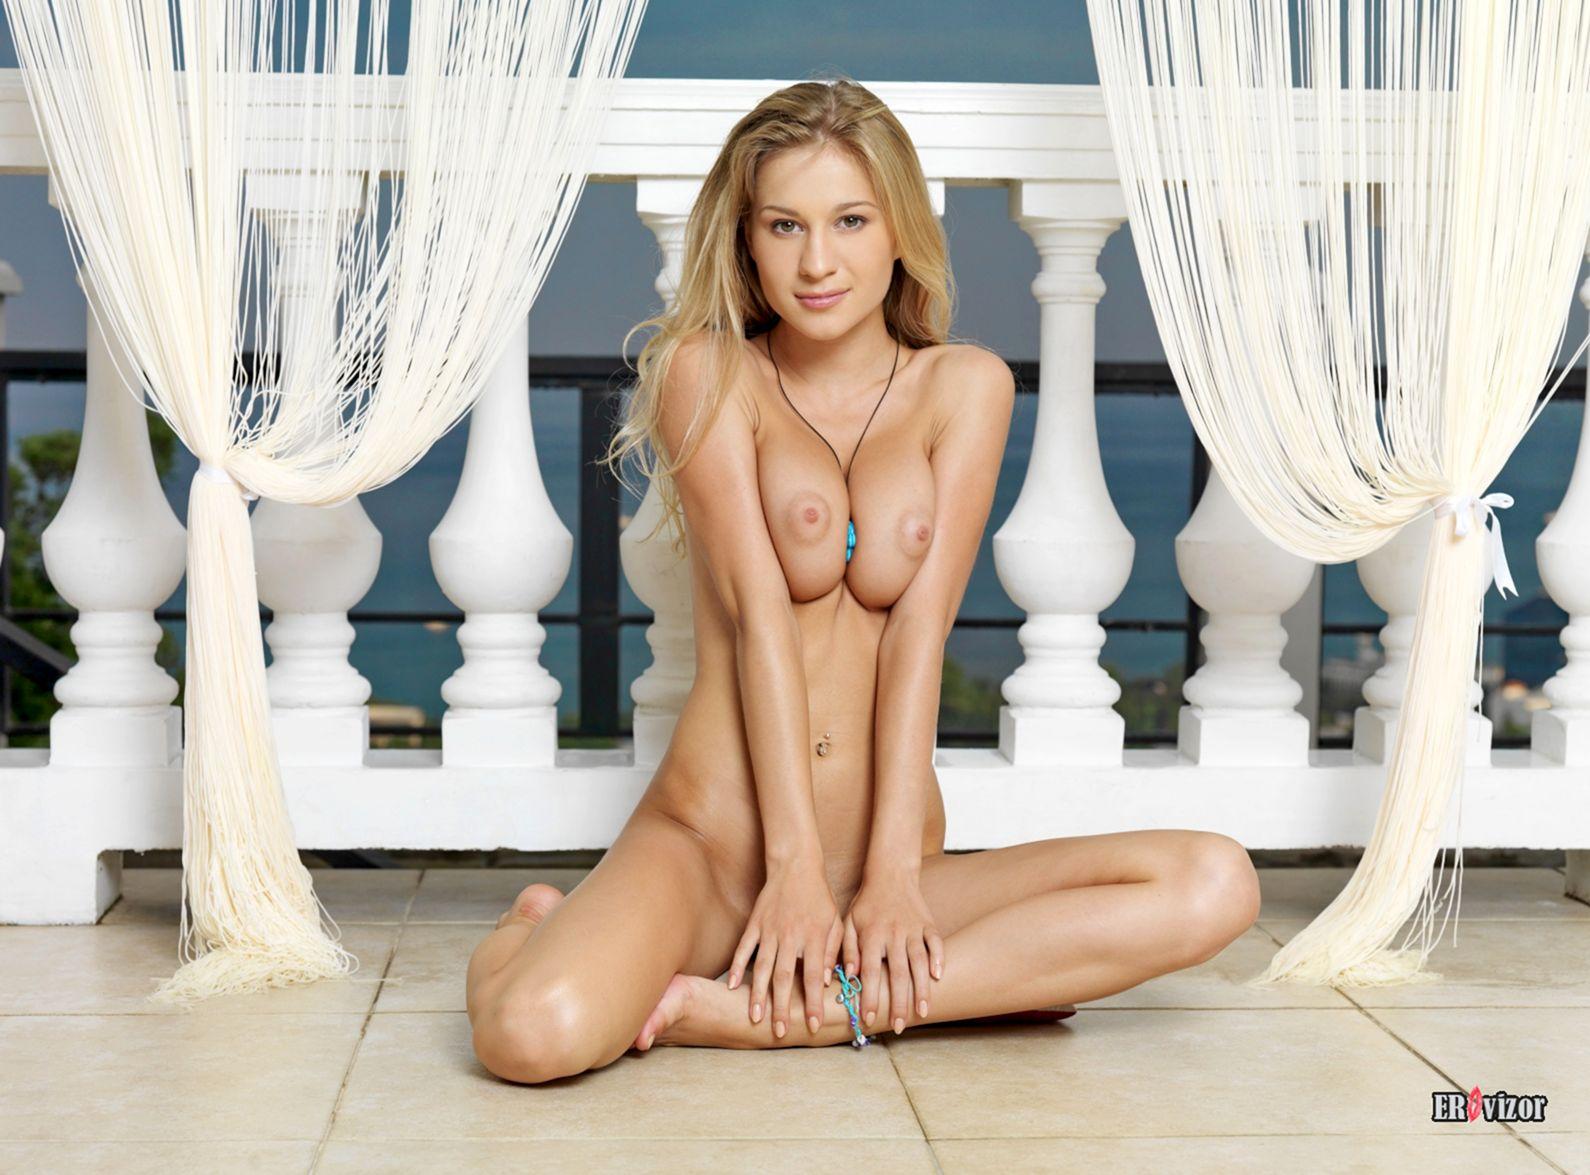 Candice B голая лежа на полу